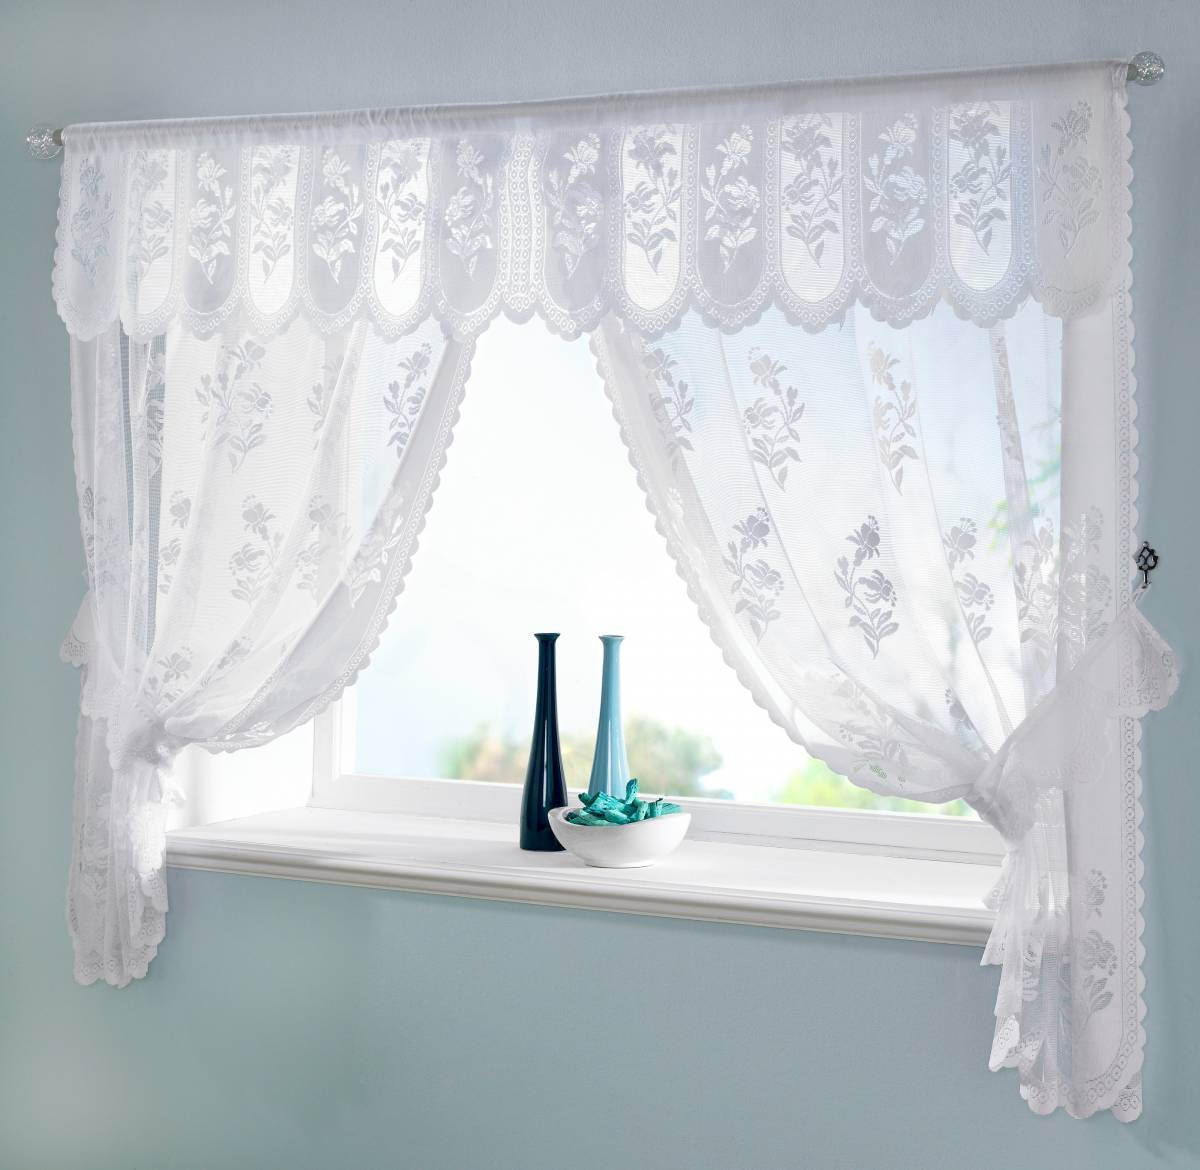 Susan window set net curtain 2 curtains for Window net curtain